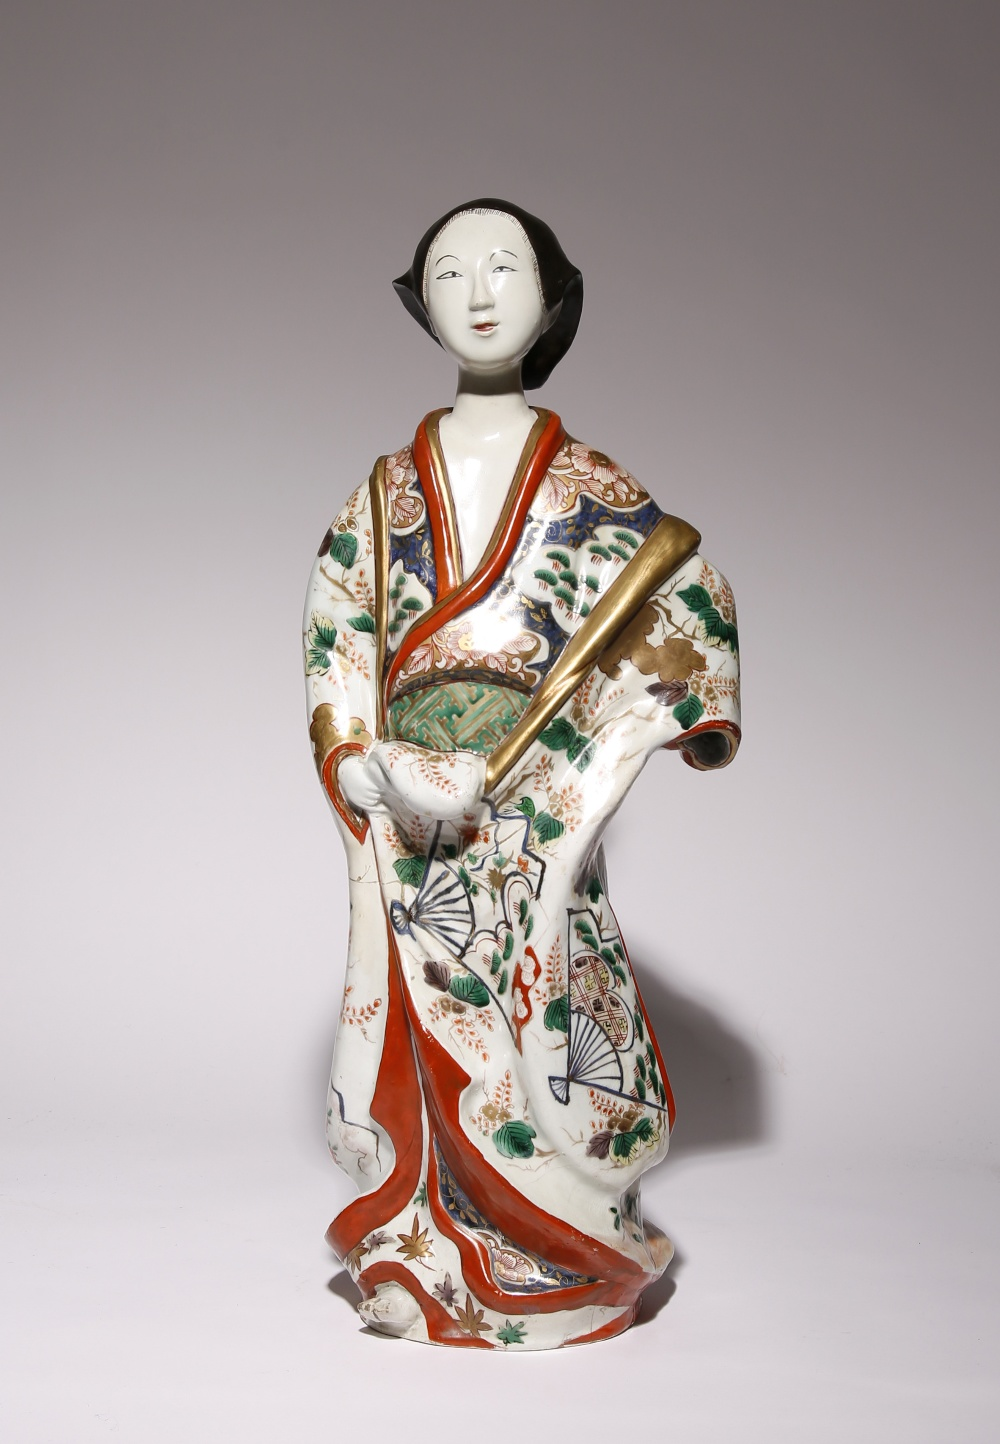 A LARGE JAPANESE IMARI FIGURE OF A BIJIN EDO PERIOD, 18TH CENTURY The elegant figure smiles gently